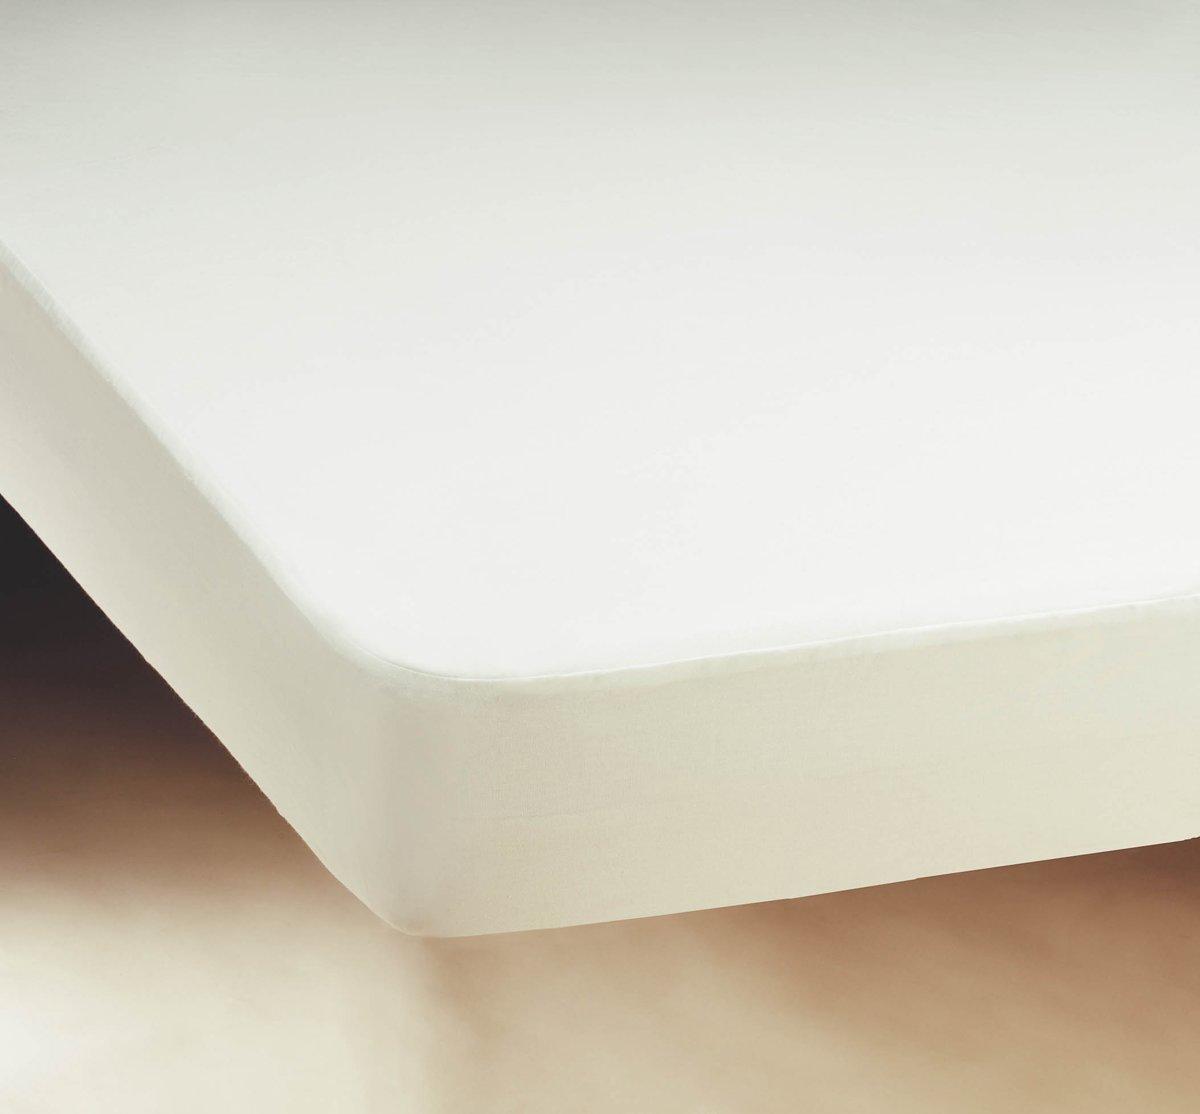 Cevilit Molton Matrashoes (Art. K200) - 120 x 220 cm kopen